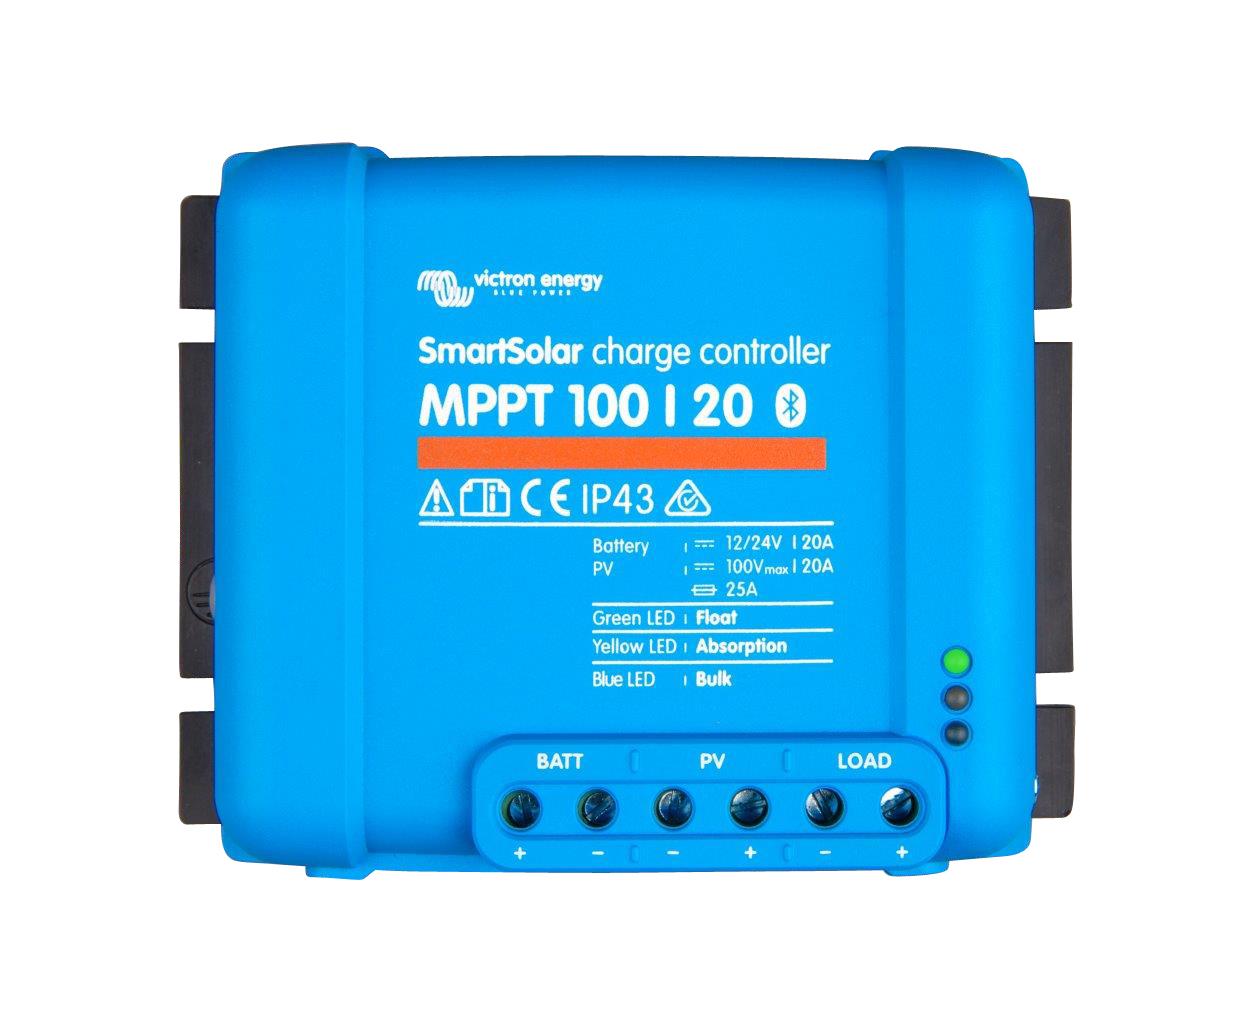 1 Stk Smartsolar Laderegler MPPT 100/20-20A (12/24V) PVBC10020S